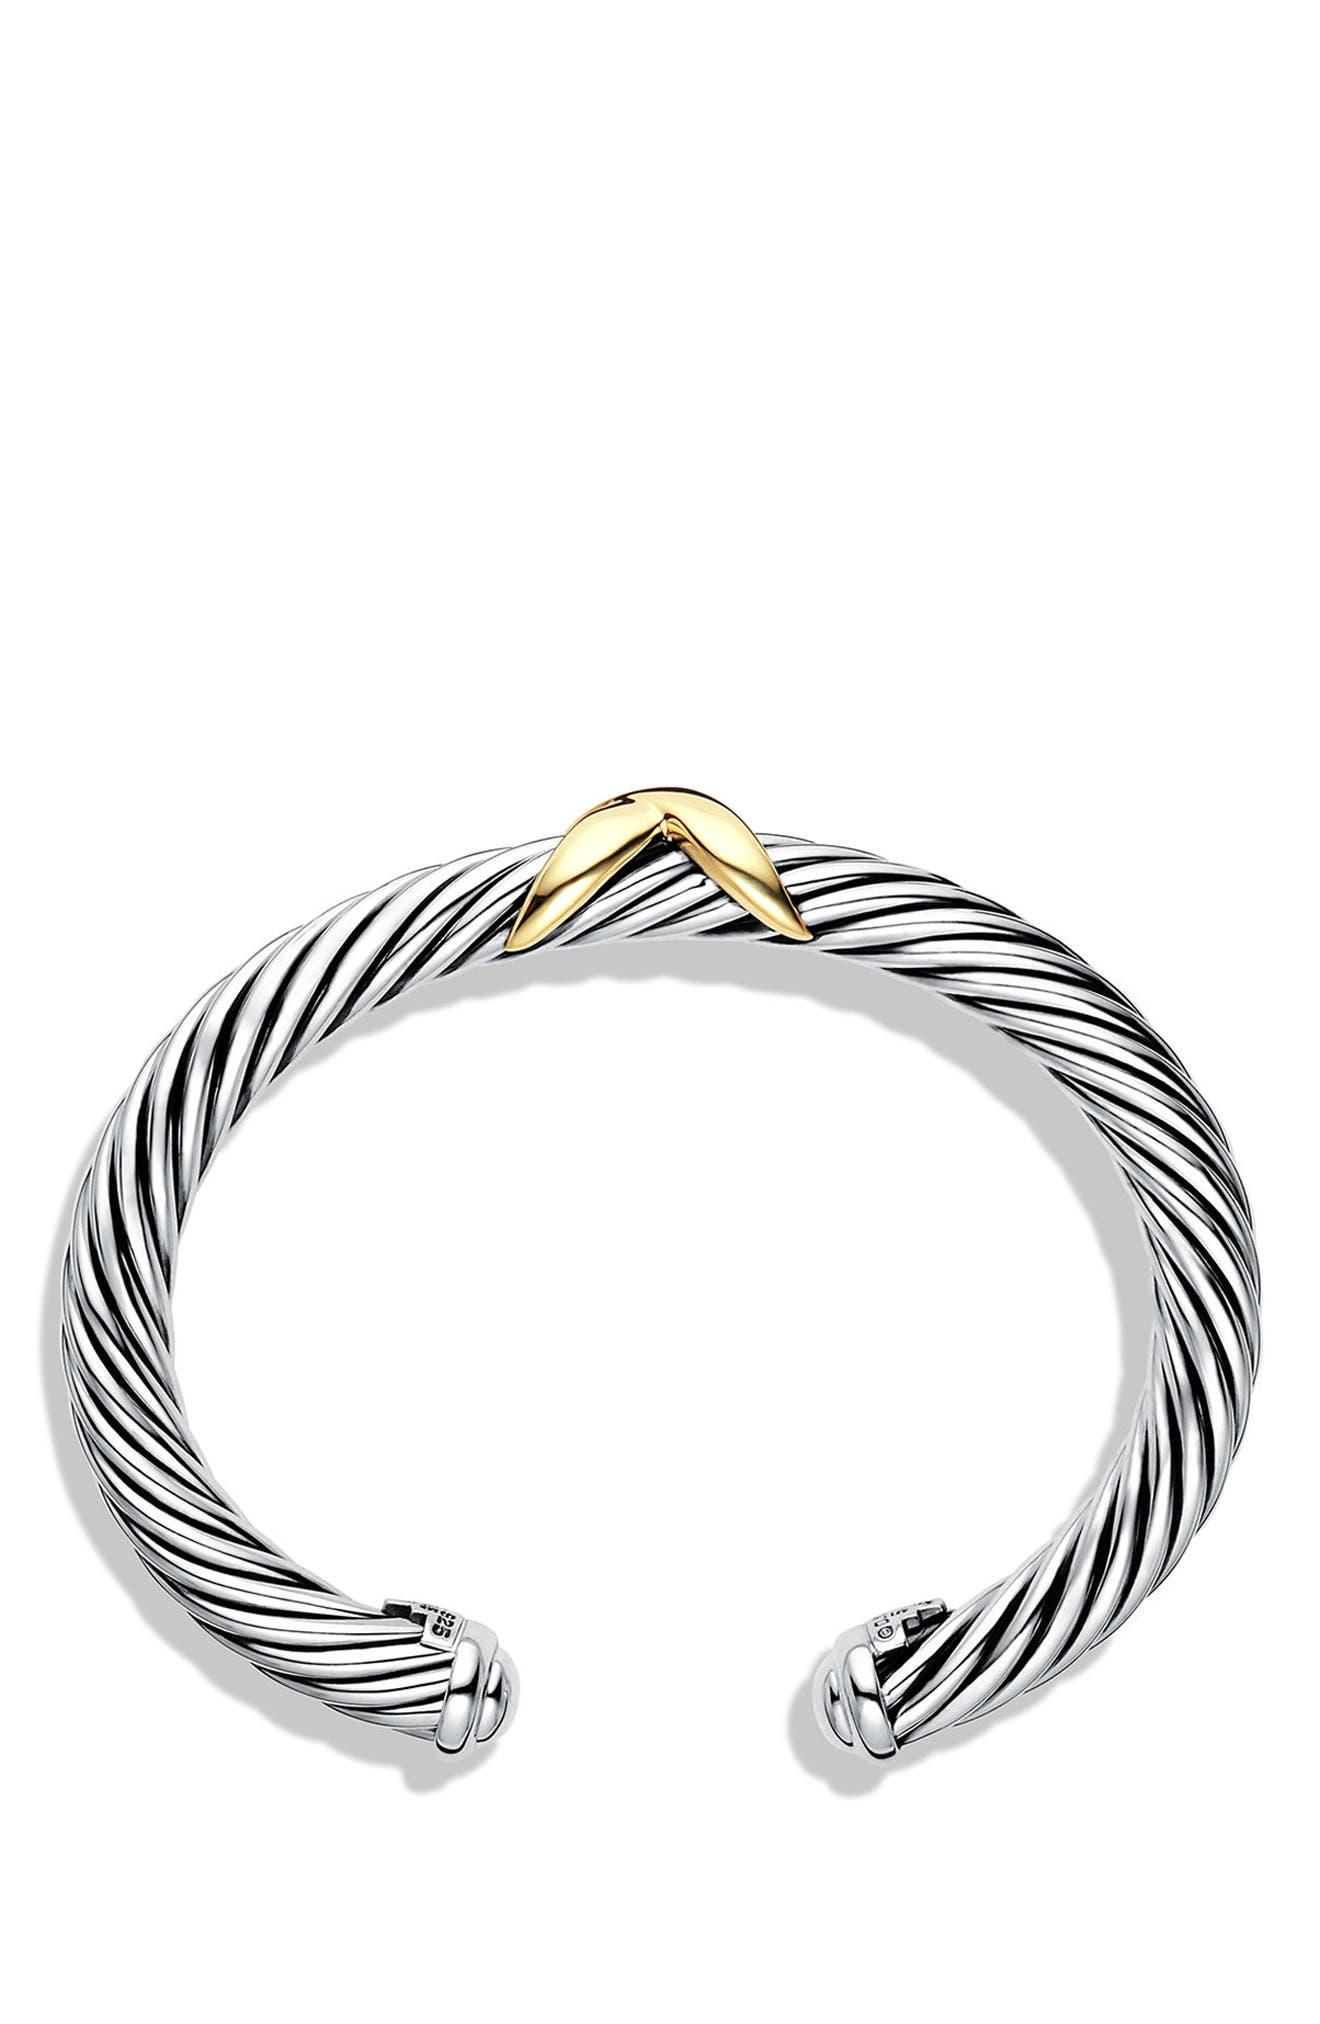 X Bracelet with 14K Gold,                             Alternate thumbnail 2, color,                             SILVER/ 14K GOLD